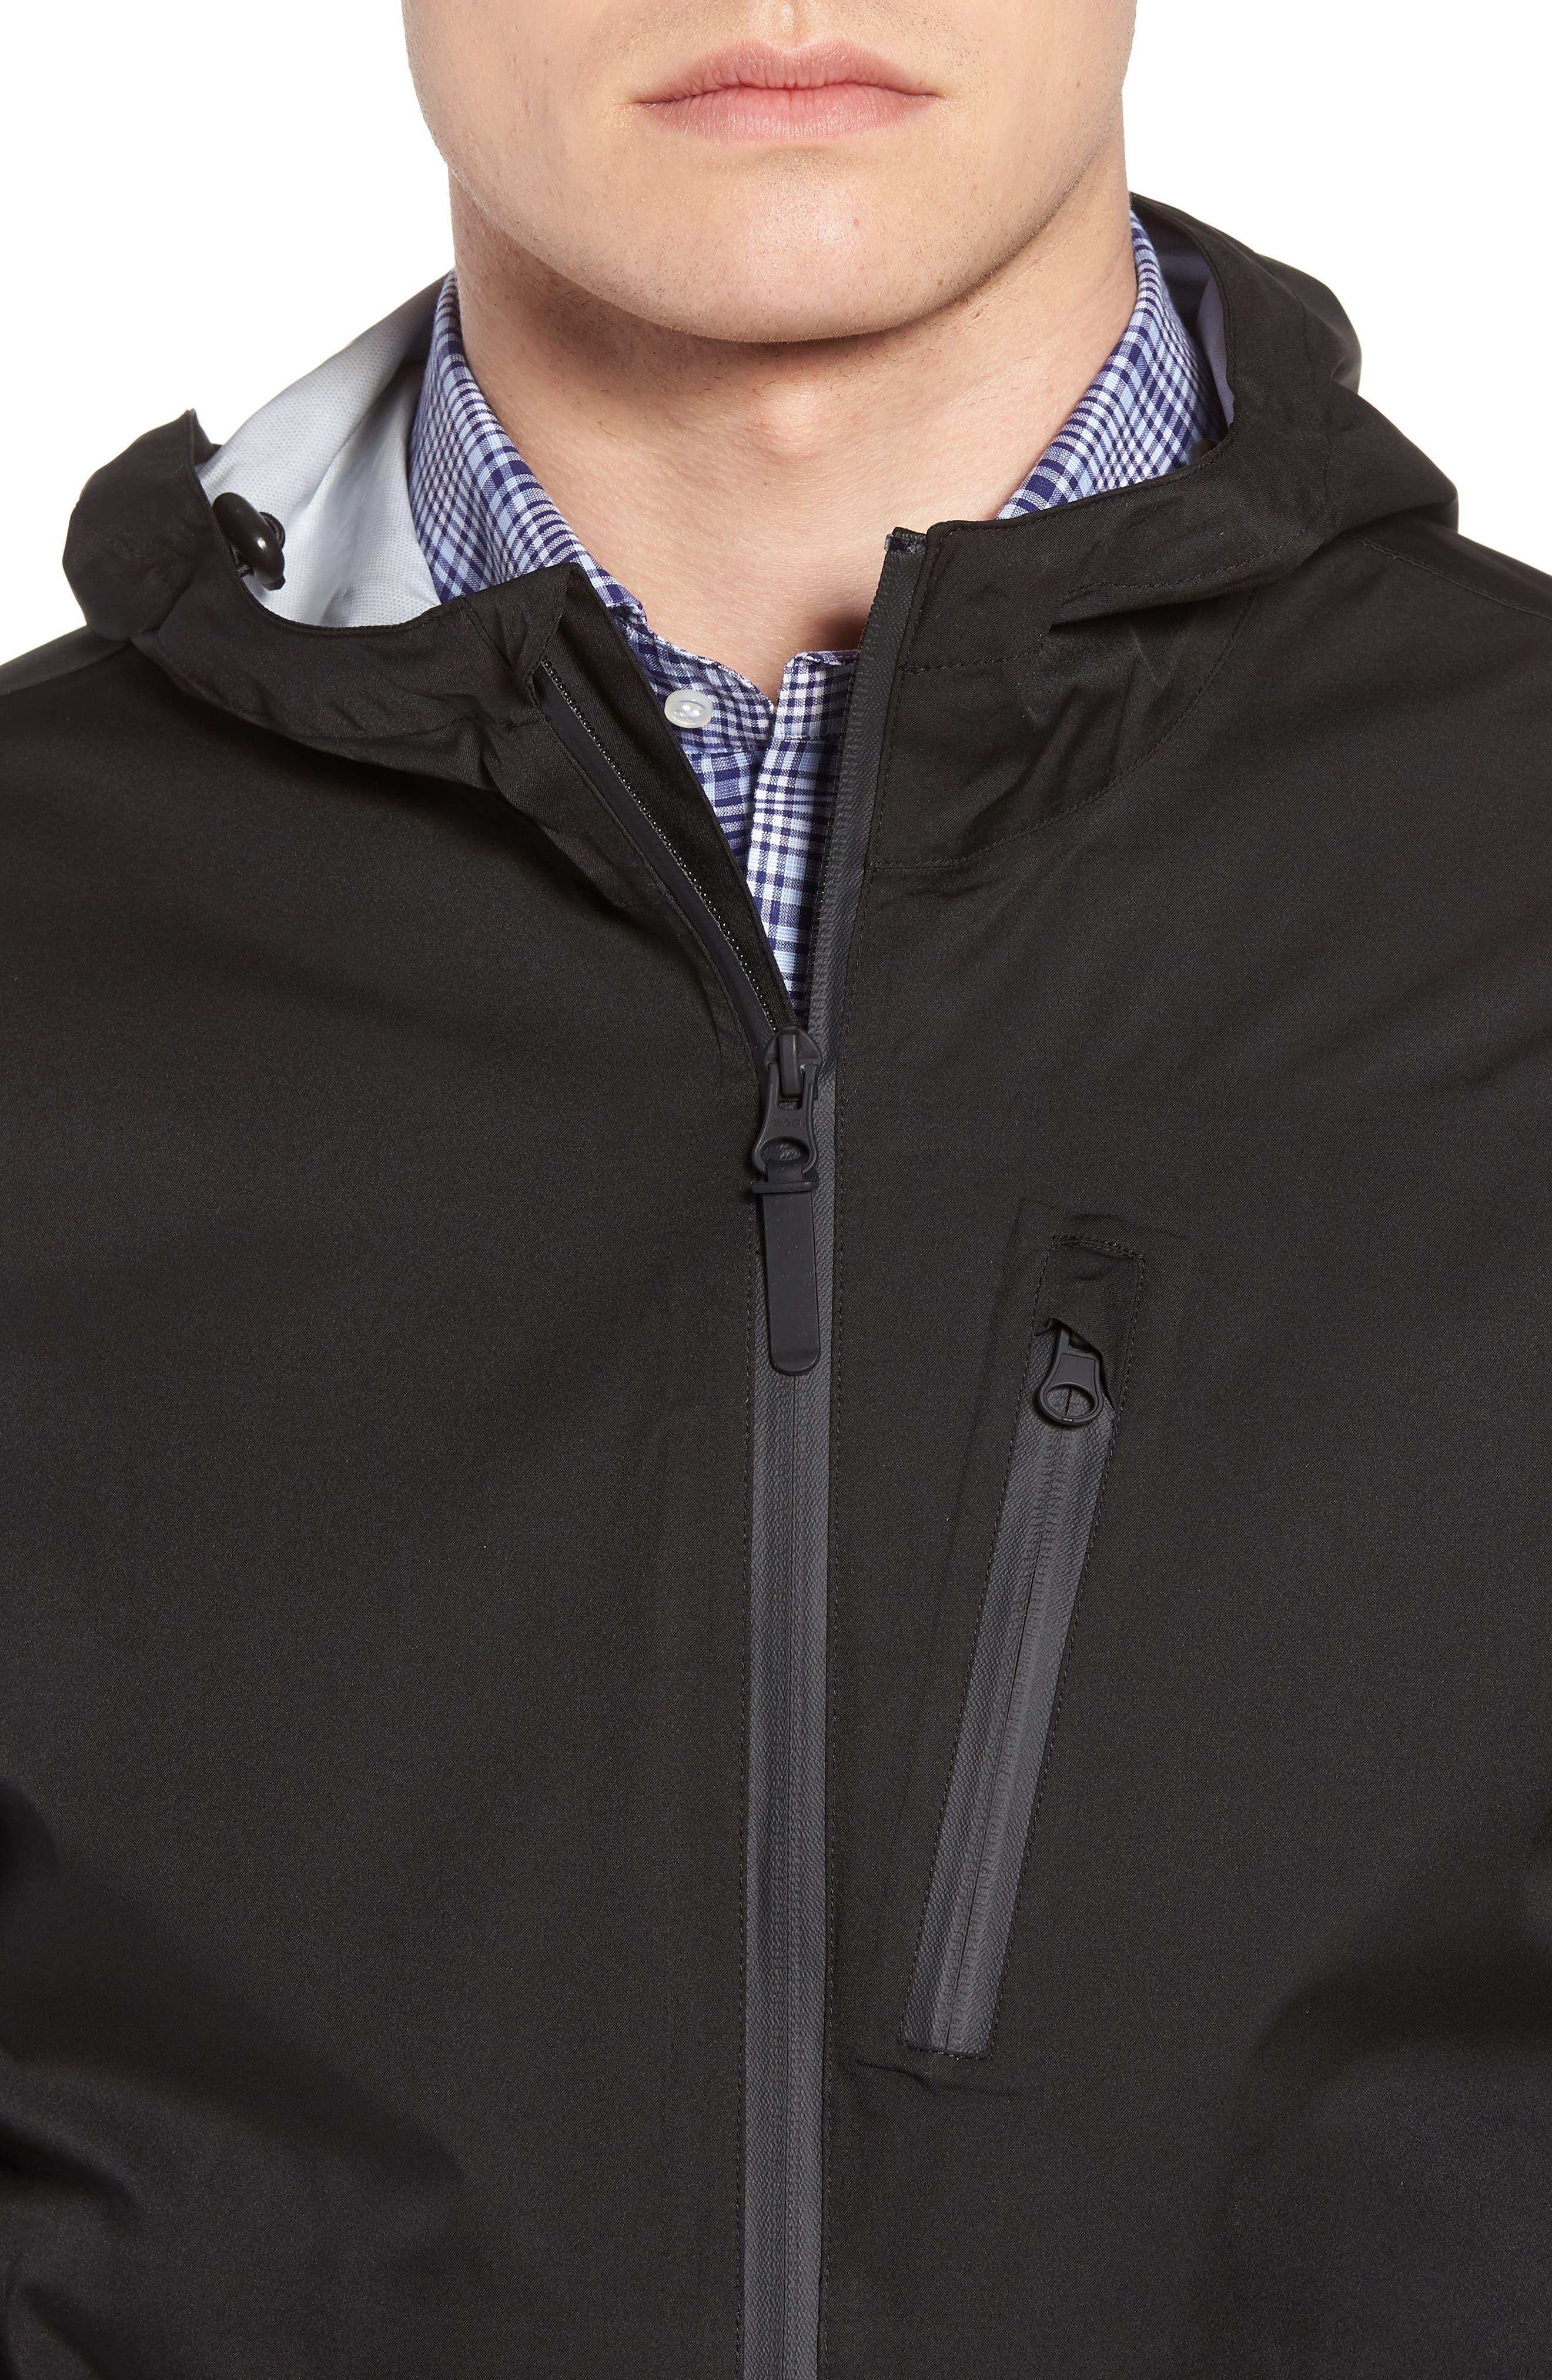 Packable Water Resistant Jacket,                             Alternate thumbnail 4, color,                             BLACK